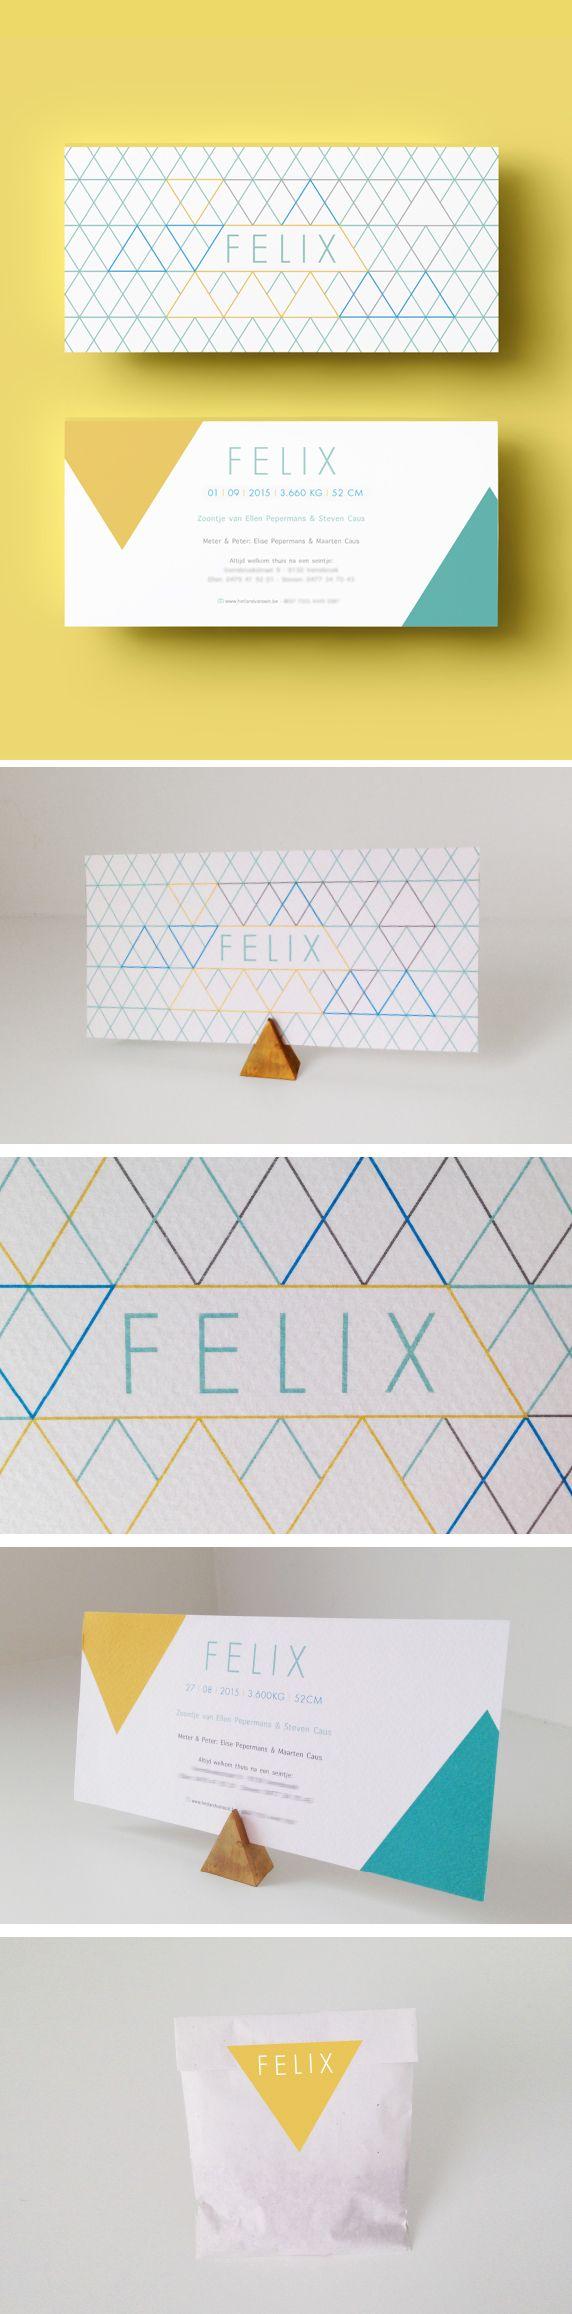 Birth Announcement / Felix